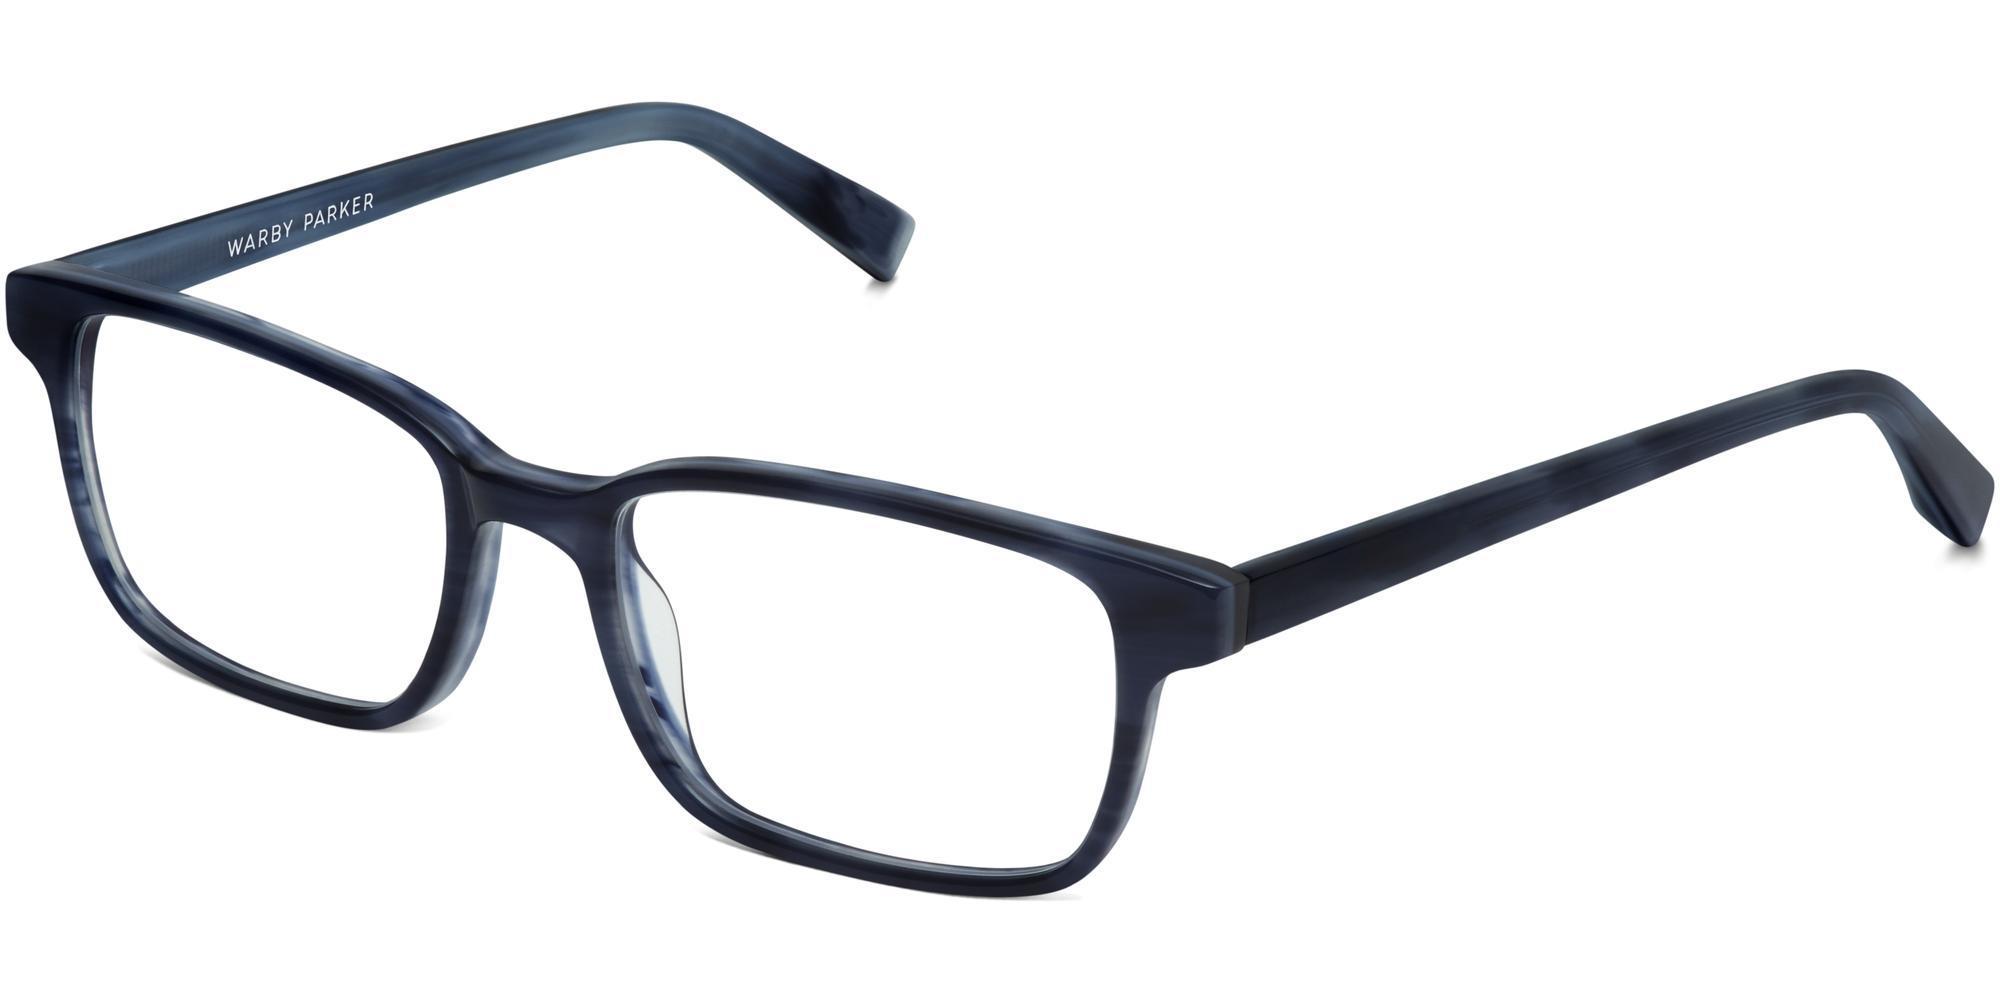 9b786885f6 Lyst - Warby Parker Crane Eyeglasses in Blue